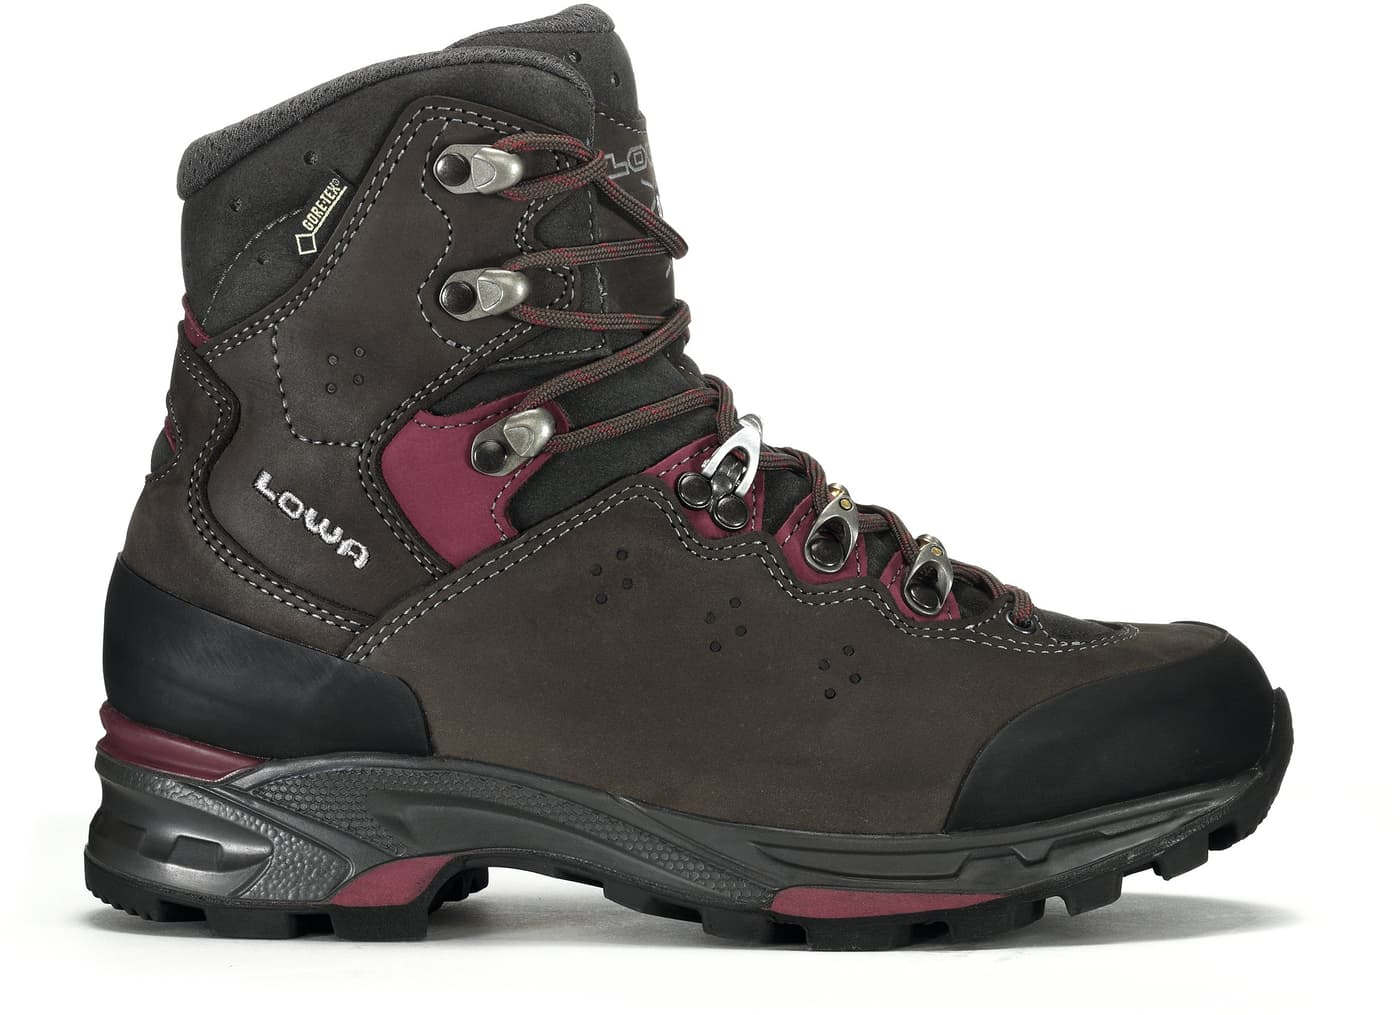 lowa chaussures de trekking pour femme lavena ii gtx migros. Black Bedroom Furniture Sets. Home Design Ideas